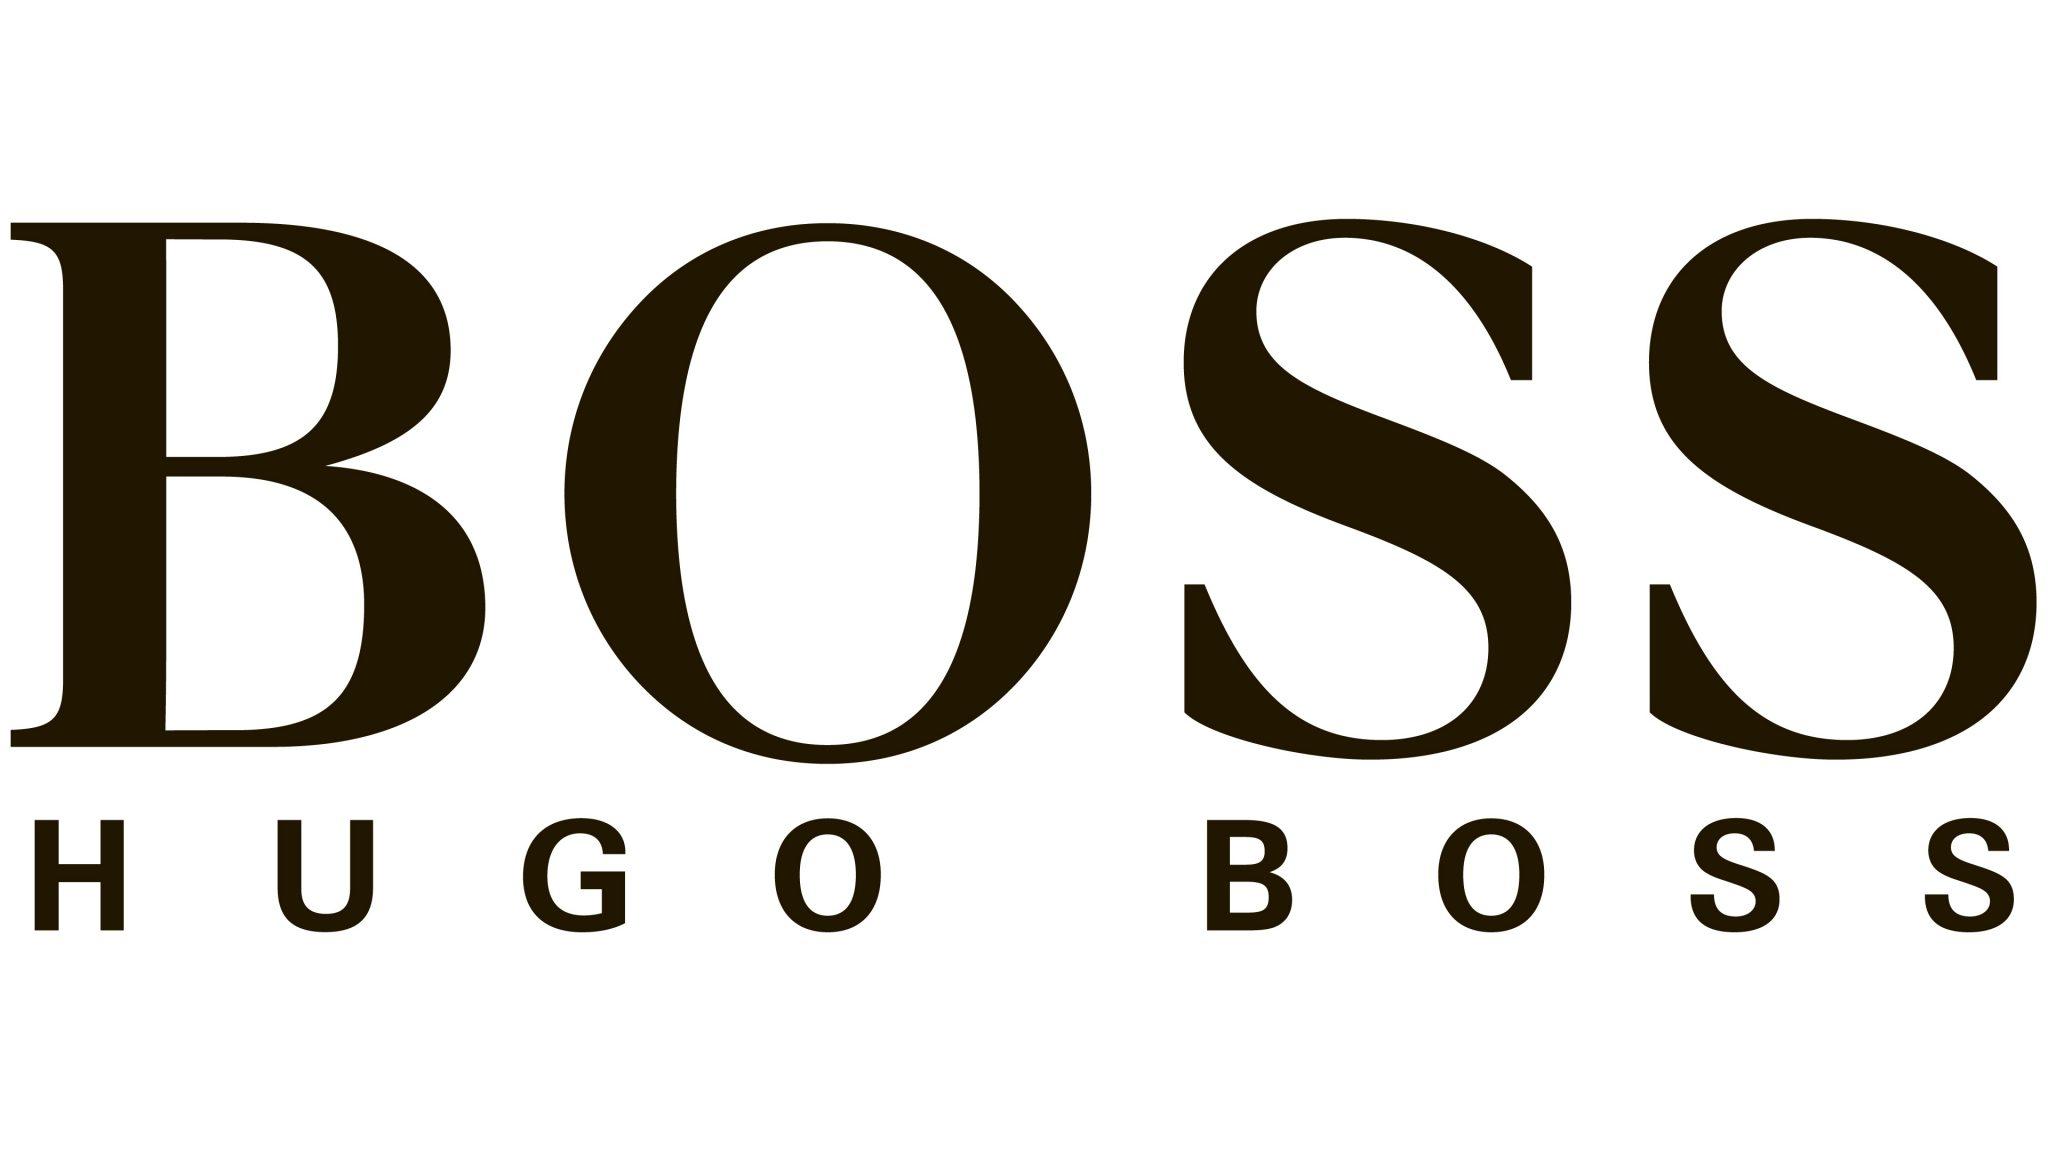 HUGO BOSS Textile Industries, Ltd.